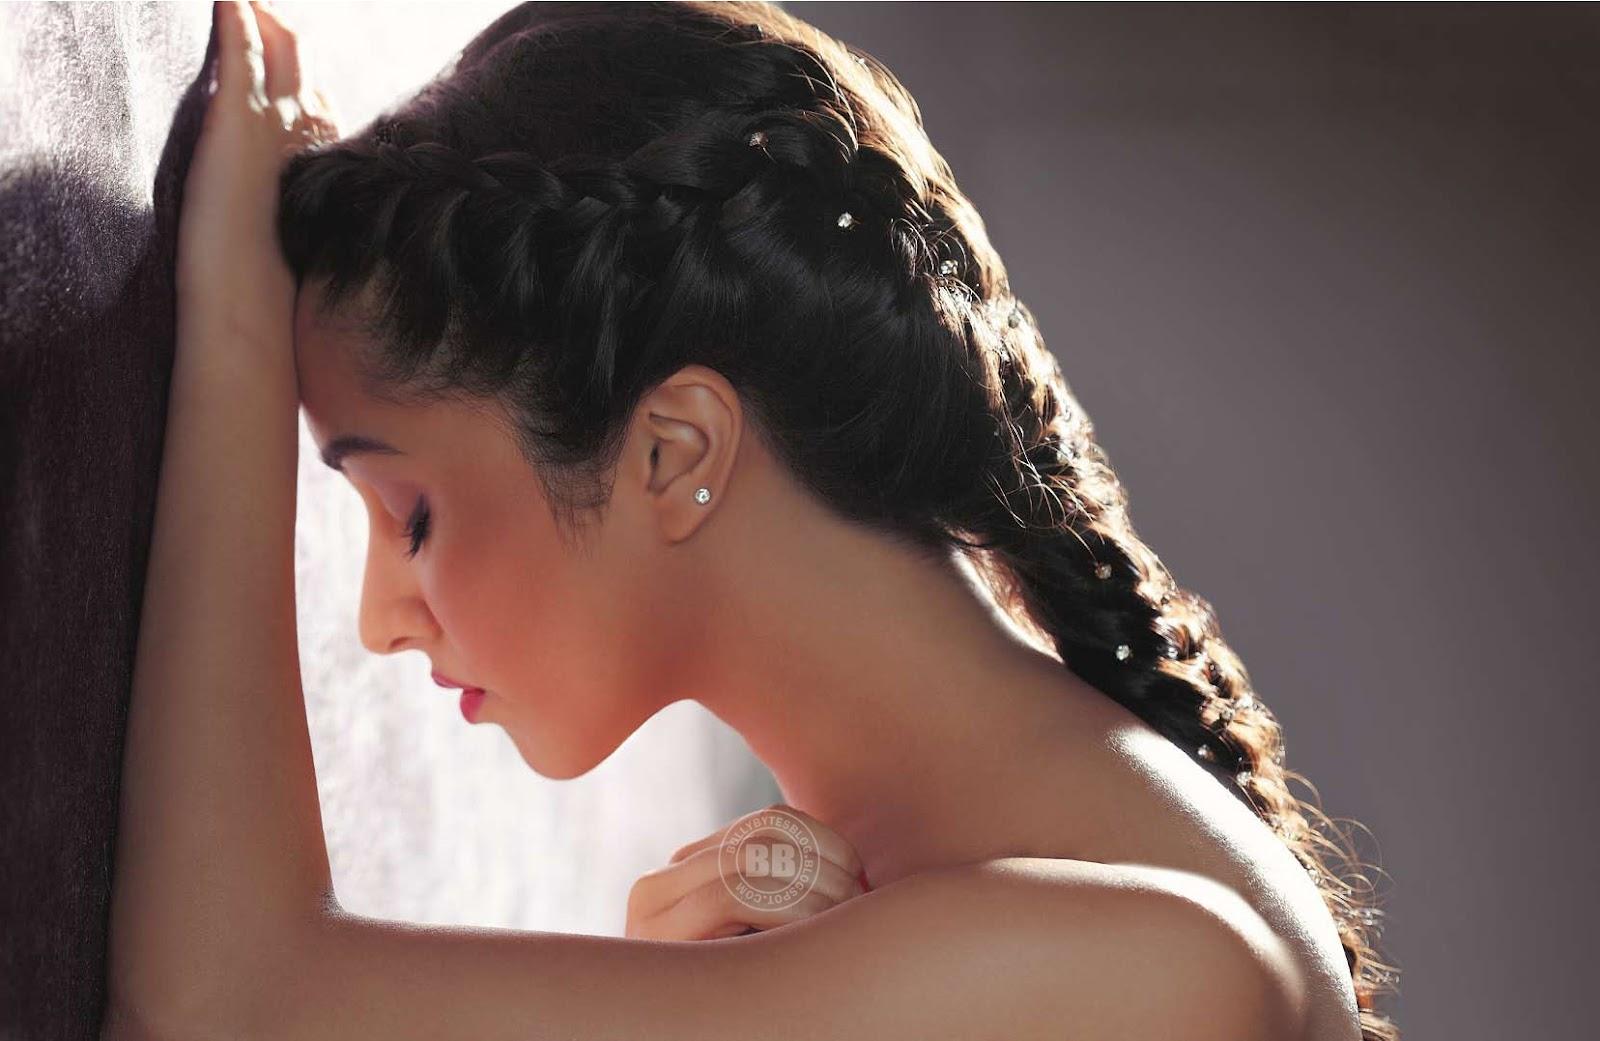 Shraddha Kapoor for Femina October 2016 promoting Rock On 2